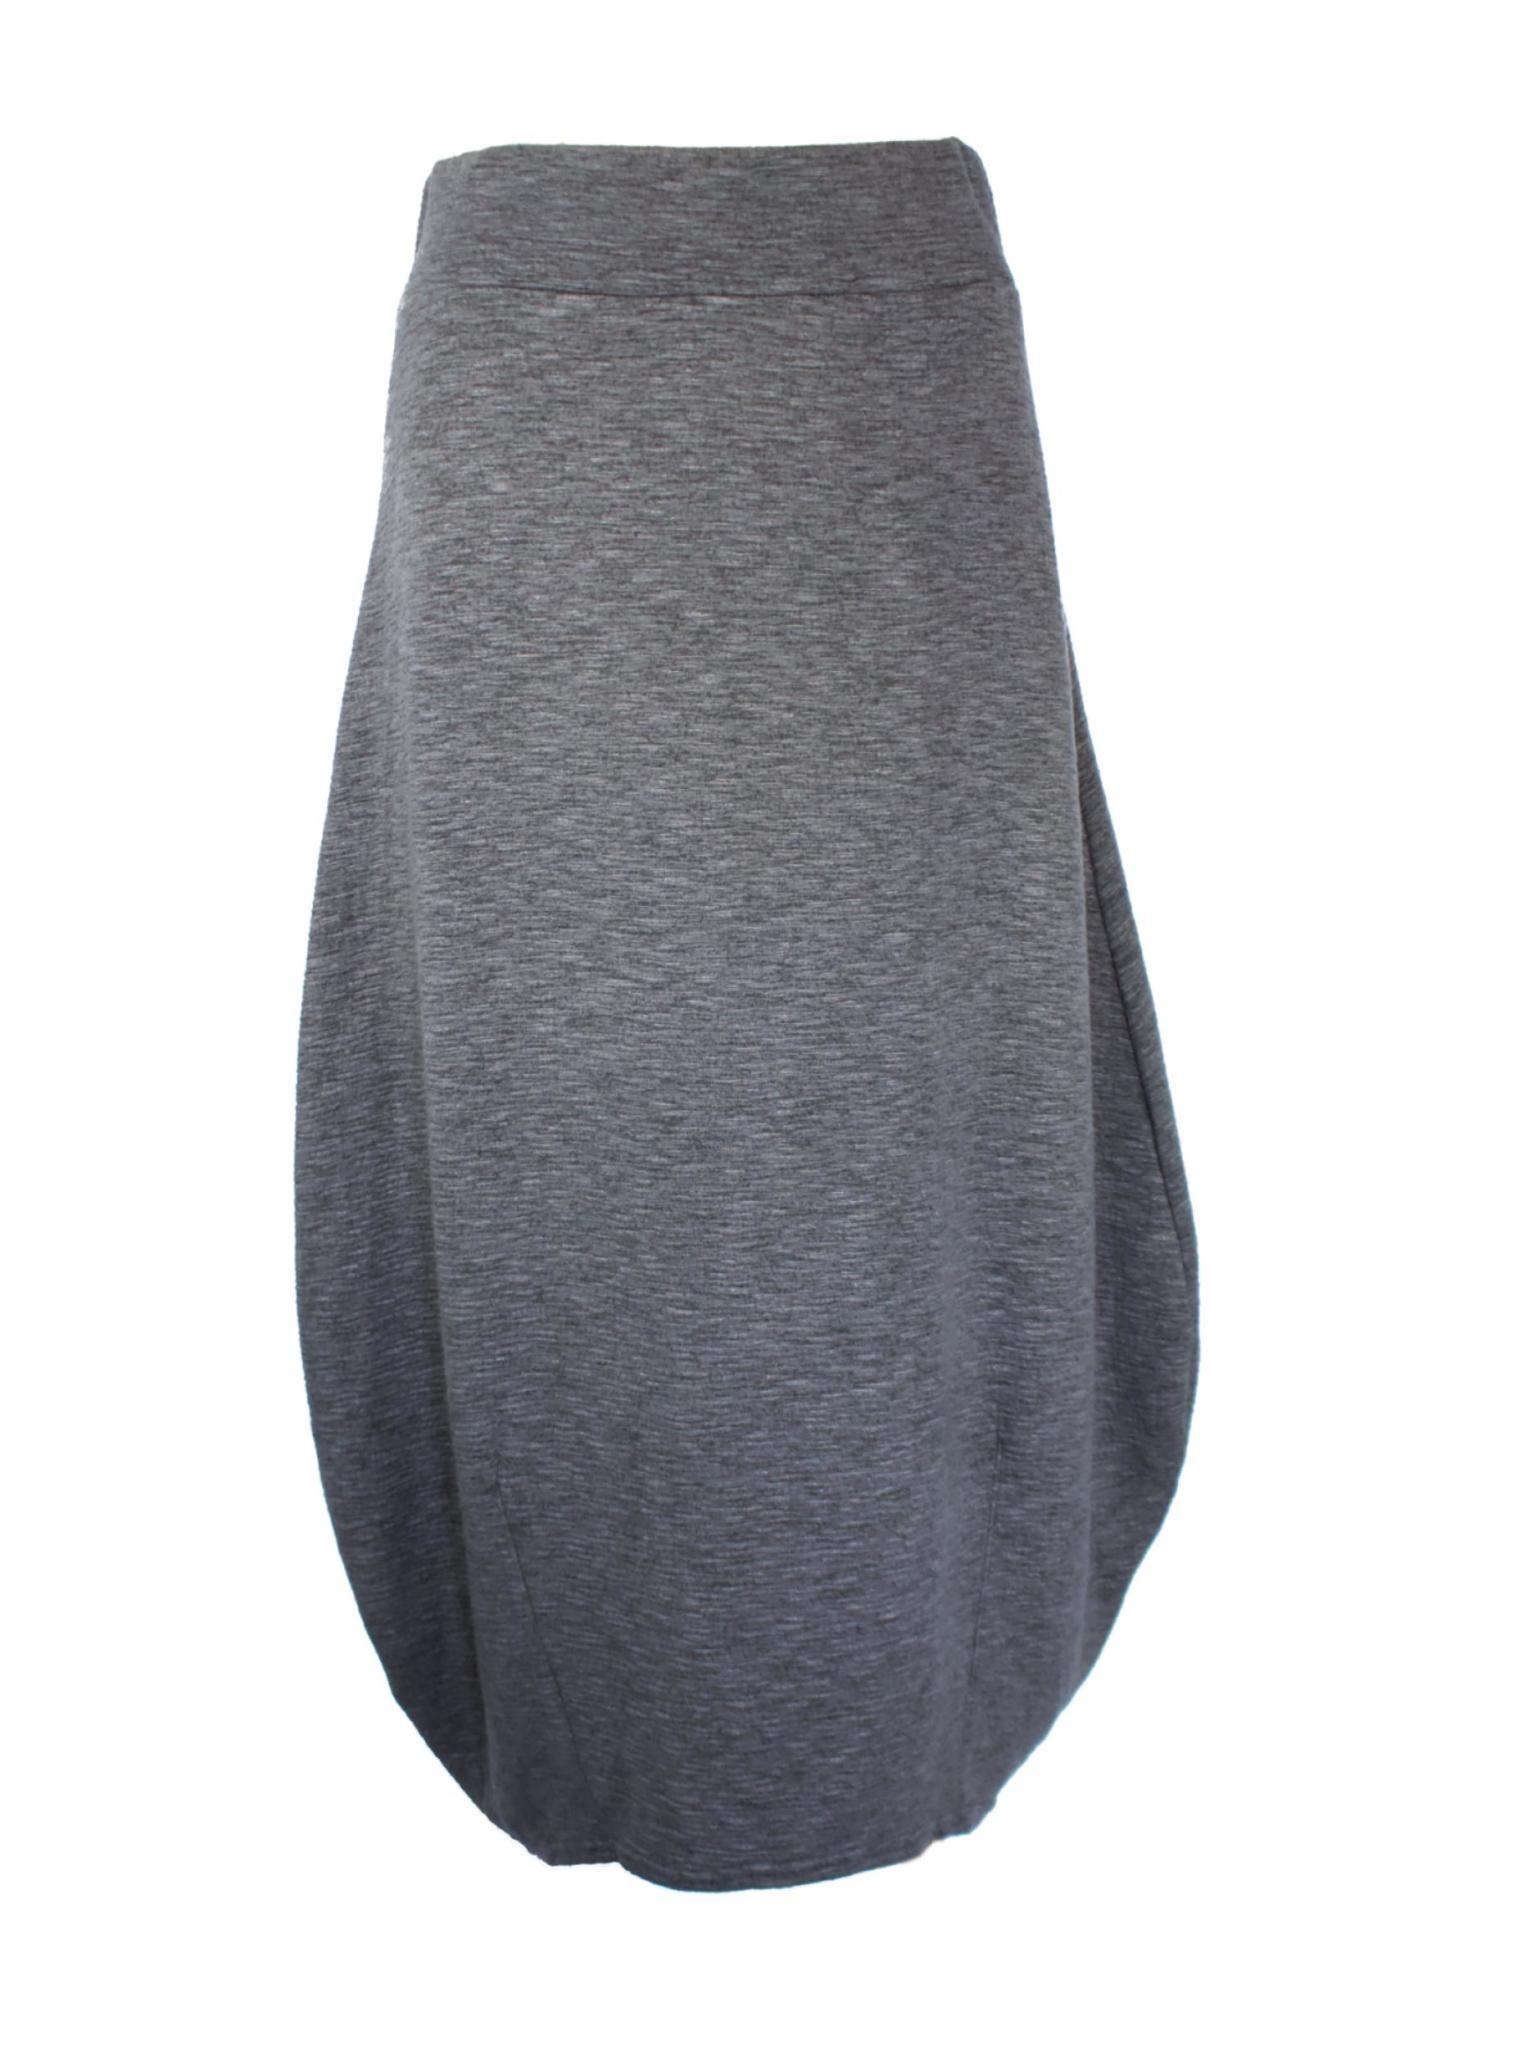 Cut Loose Crimped Fabric Lantern Skirt